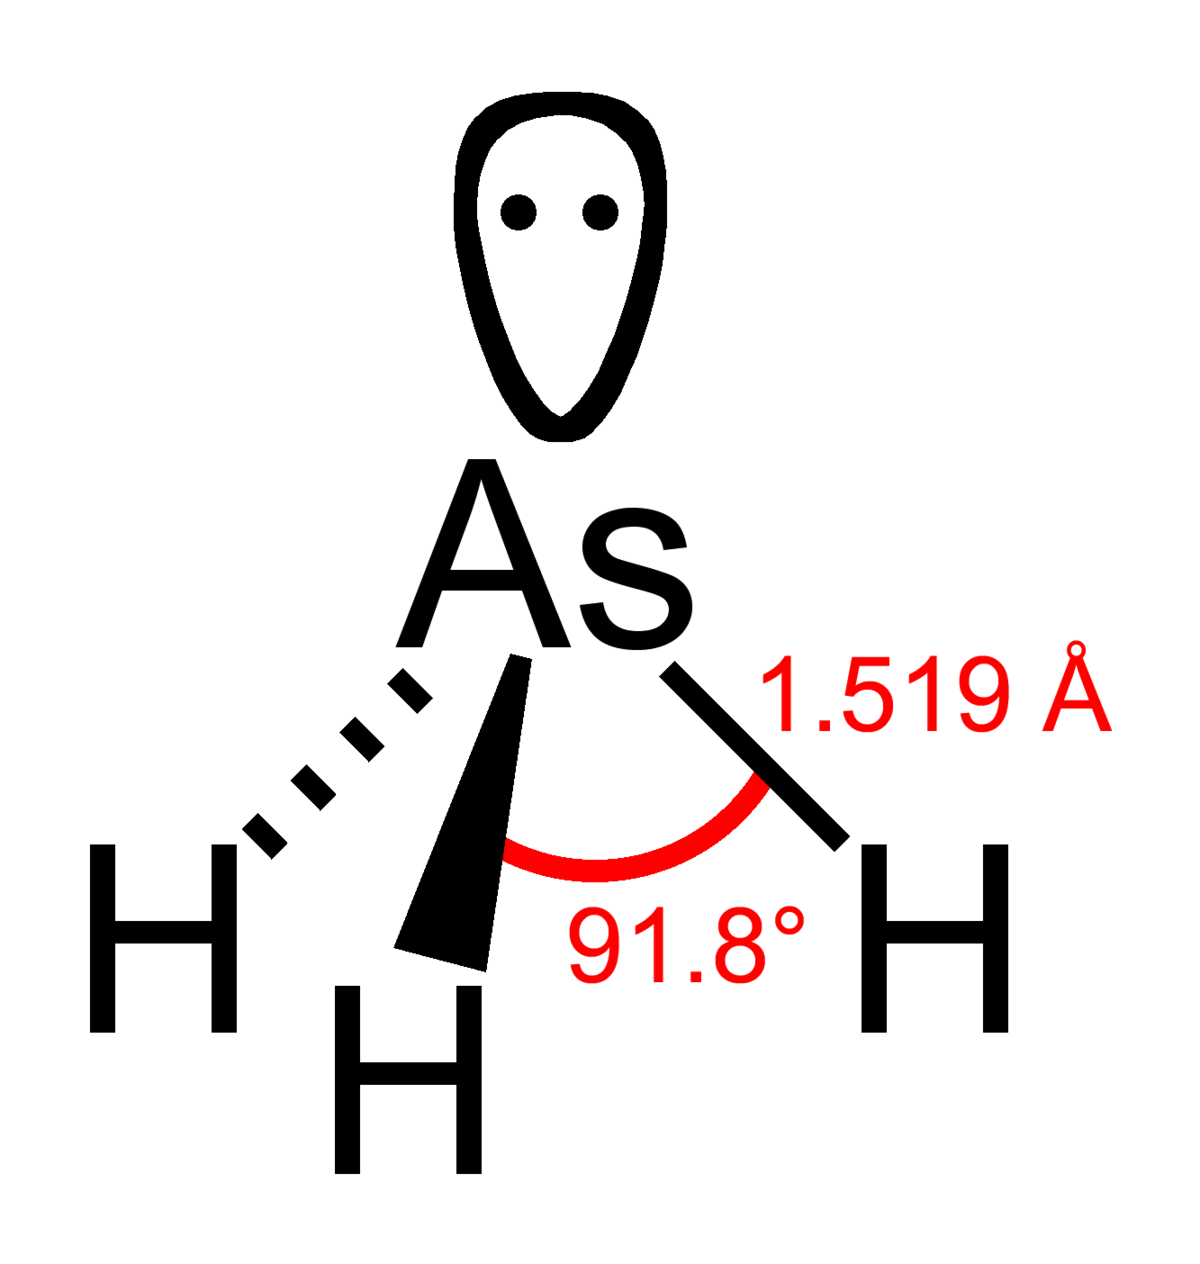 arsine wikipedia